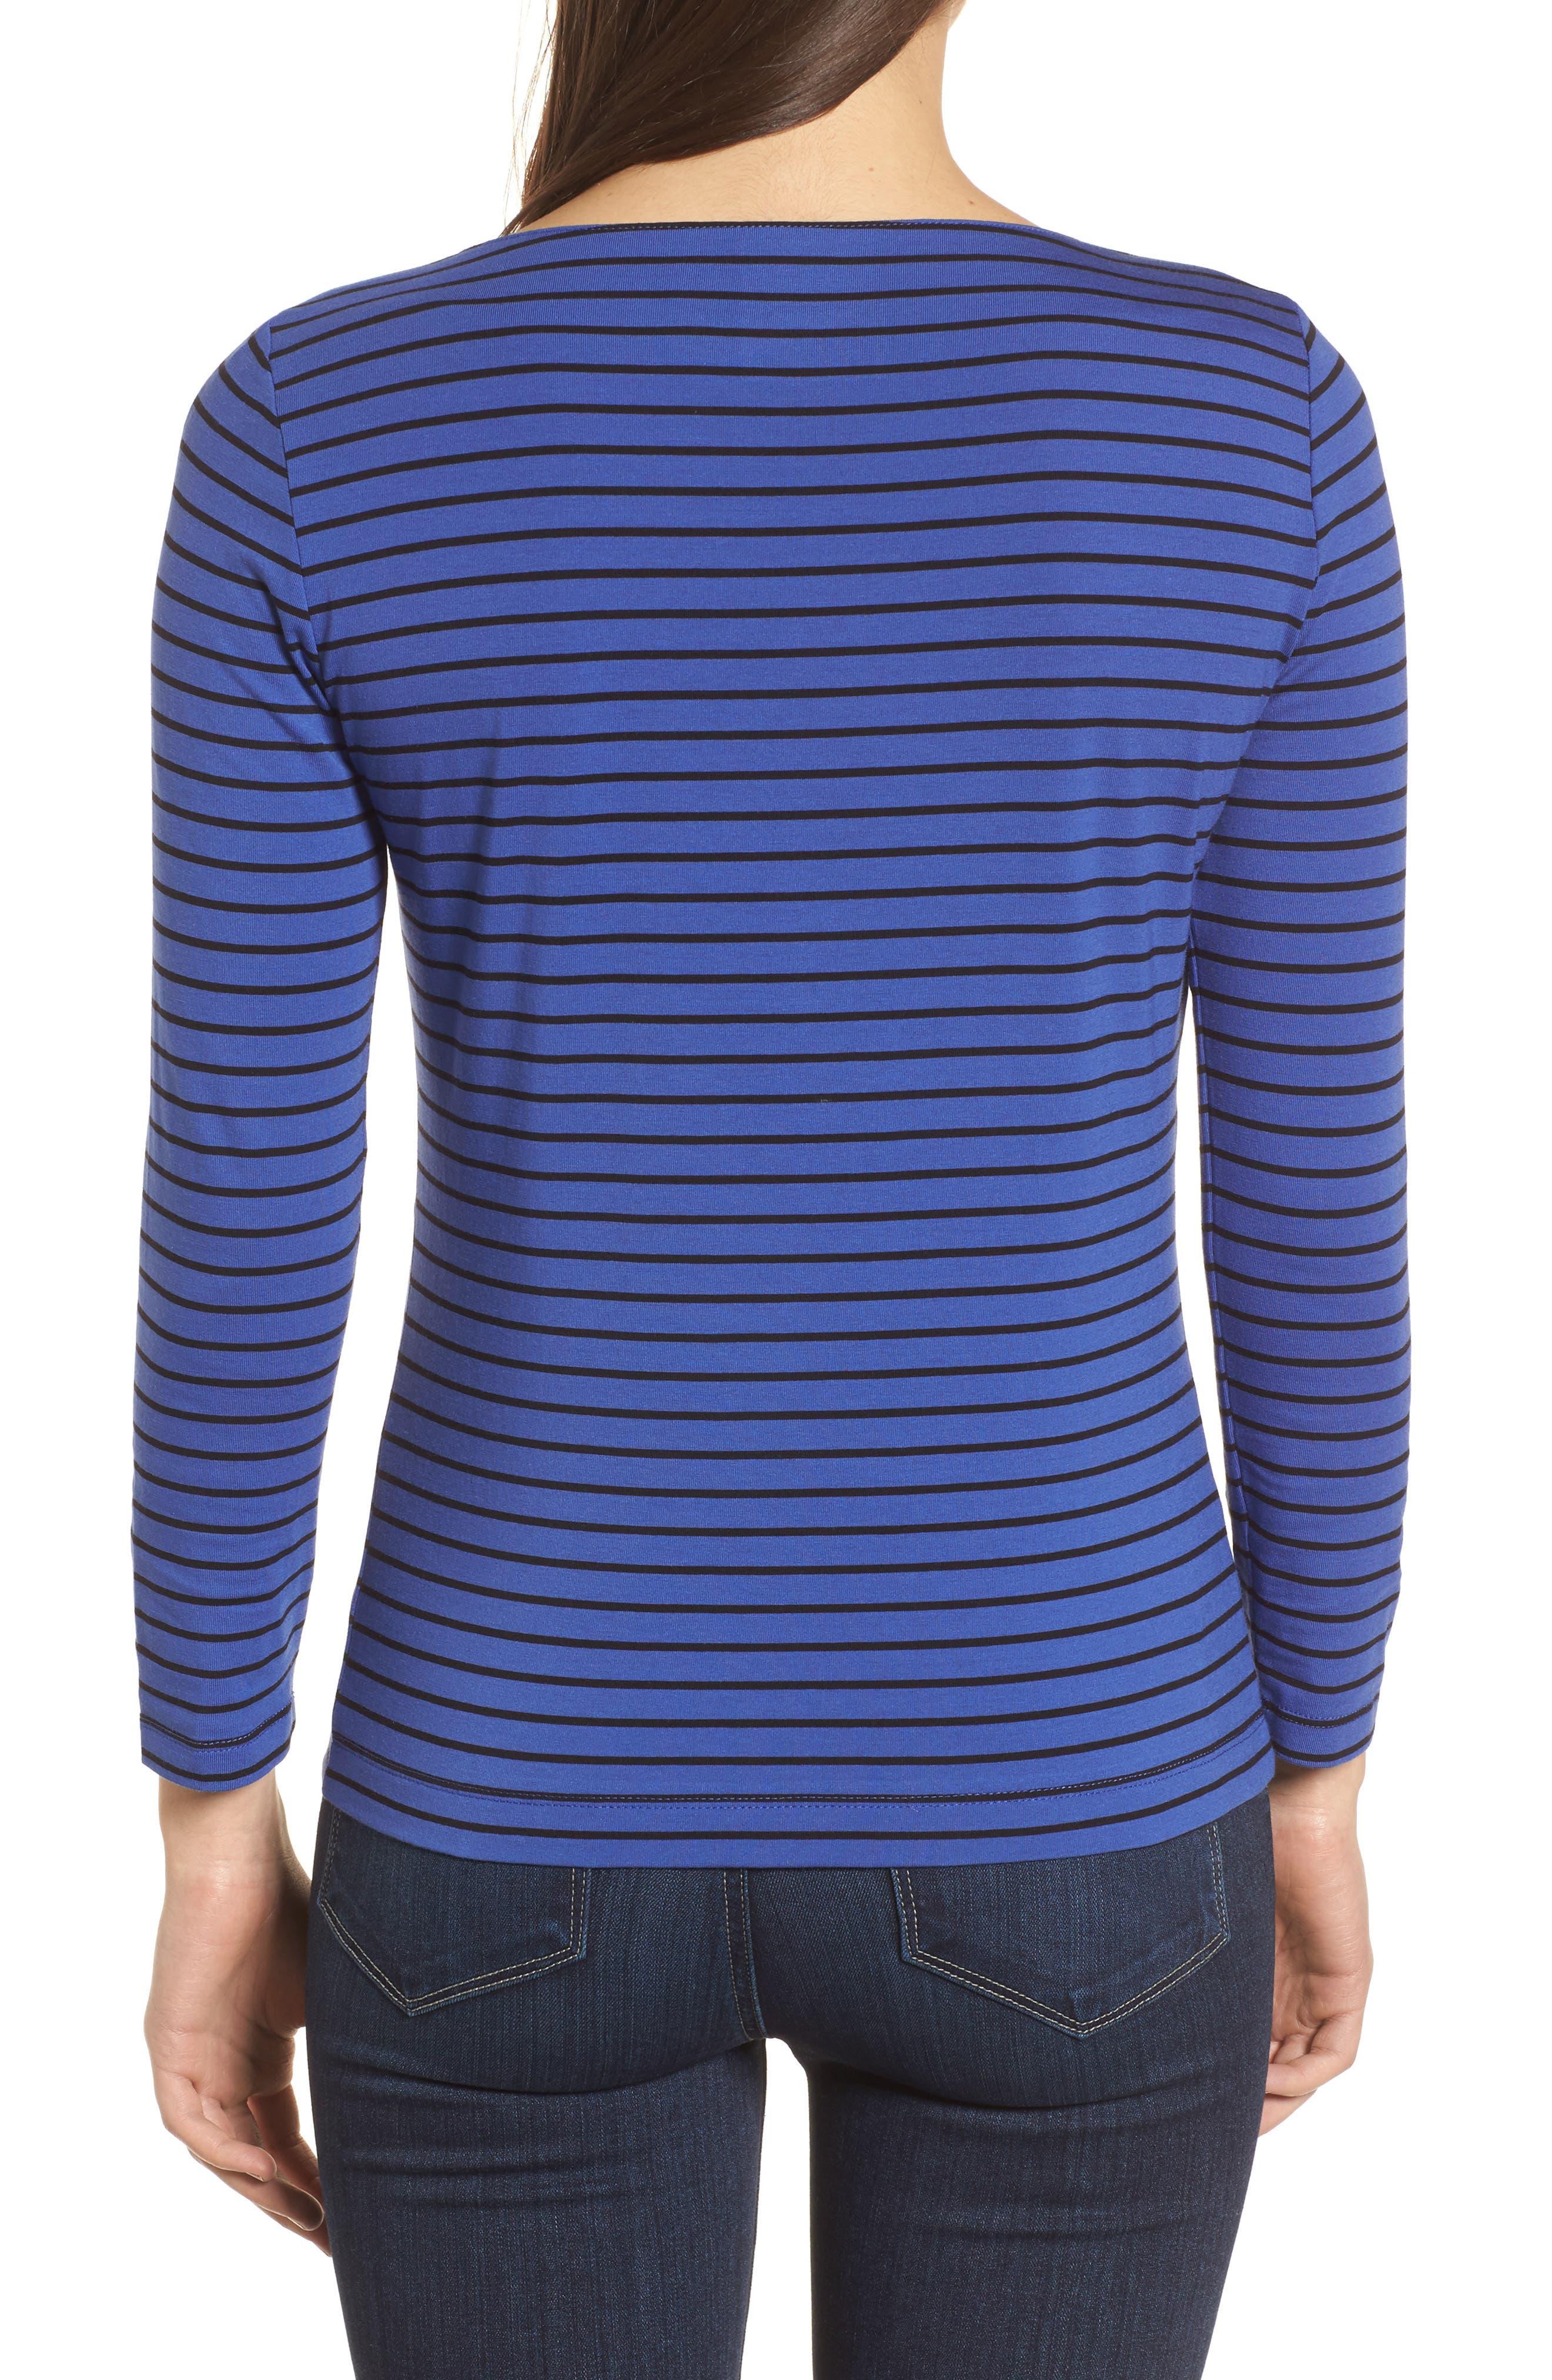 Stripe Knit Boatneck Top,                             Alternate thumbnail 2, color,                             Okeeffe Blue/ Black